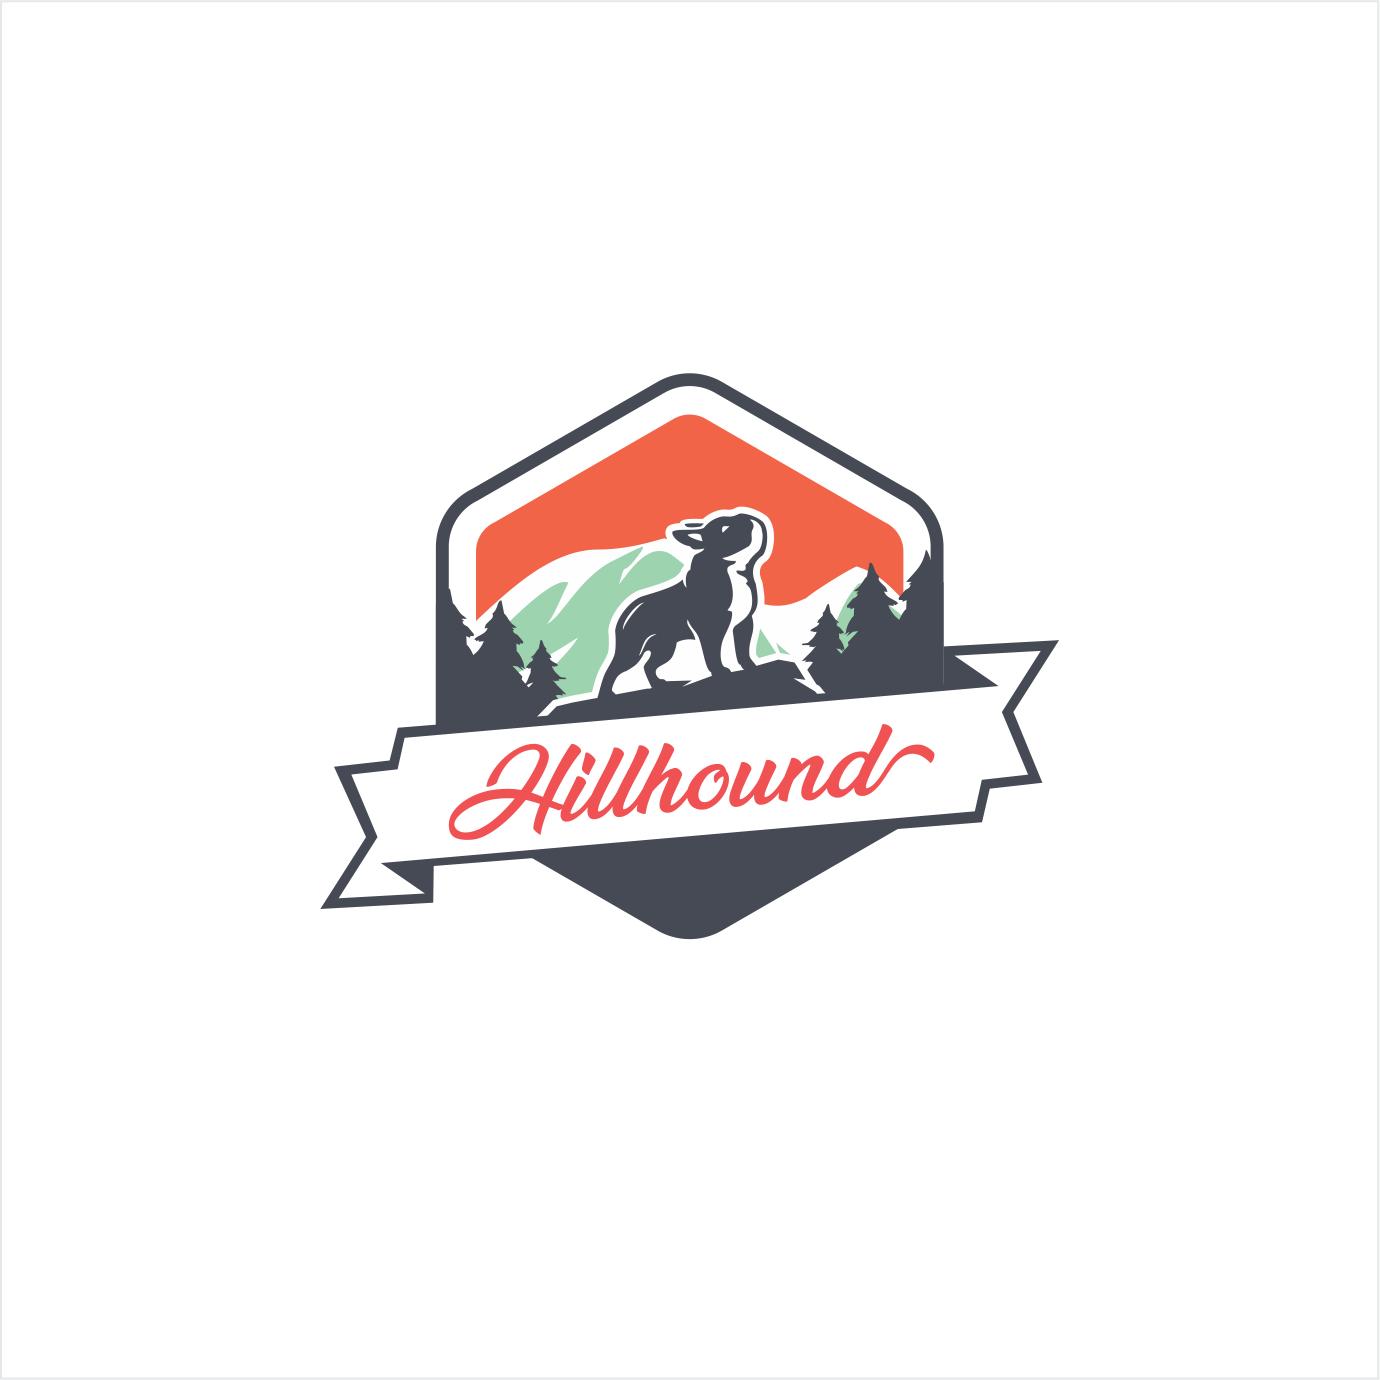 Design a outdoorsy logo for Hillhound Productions